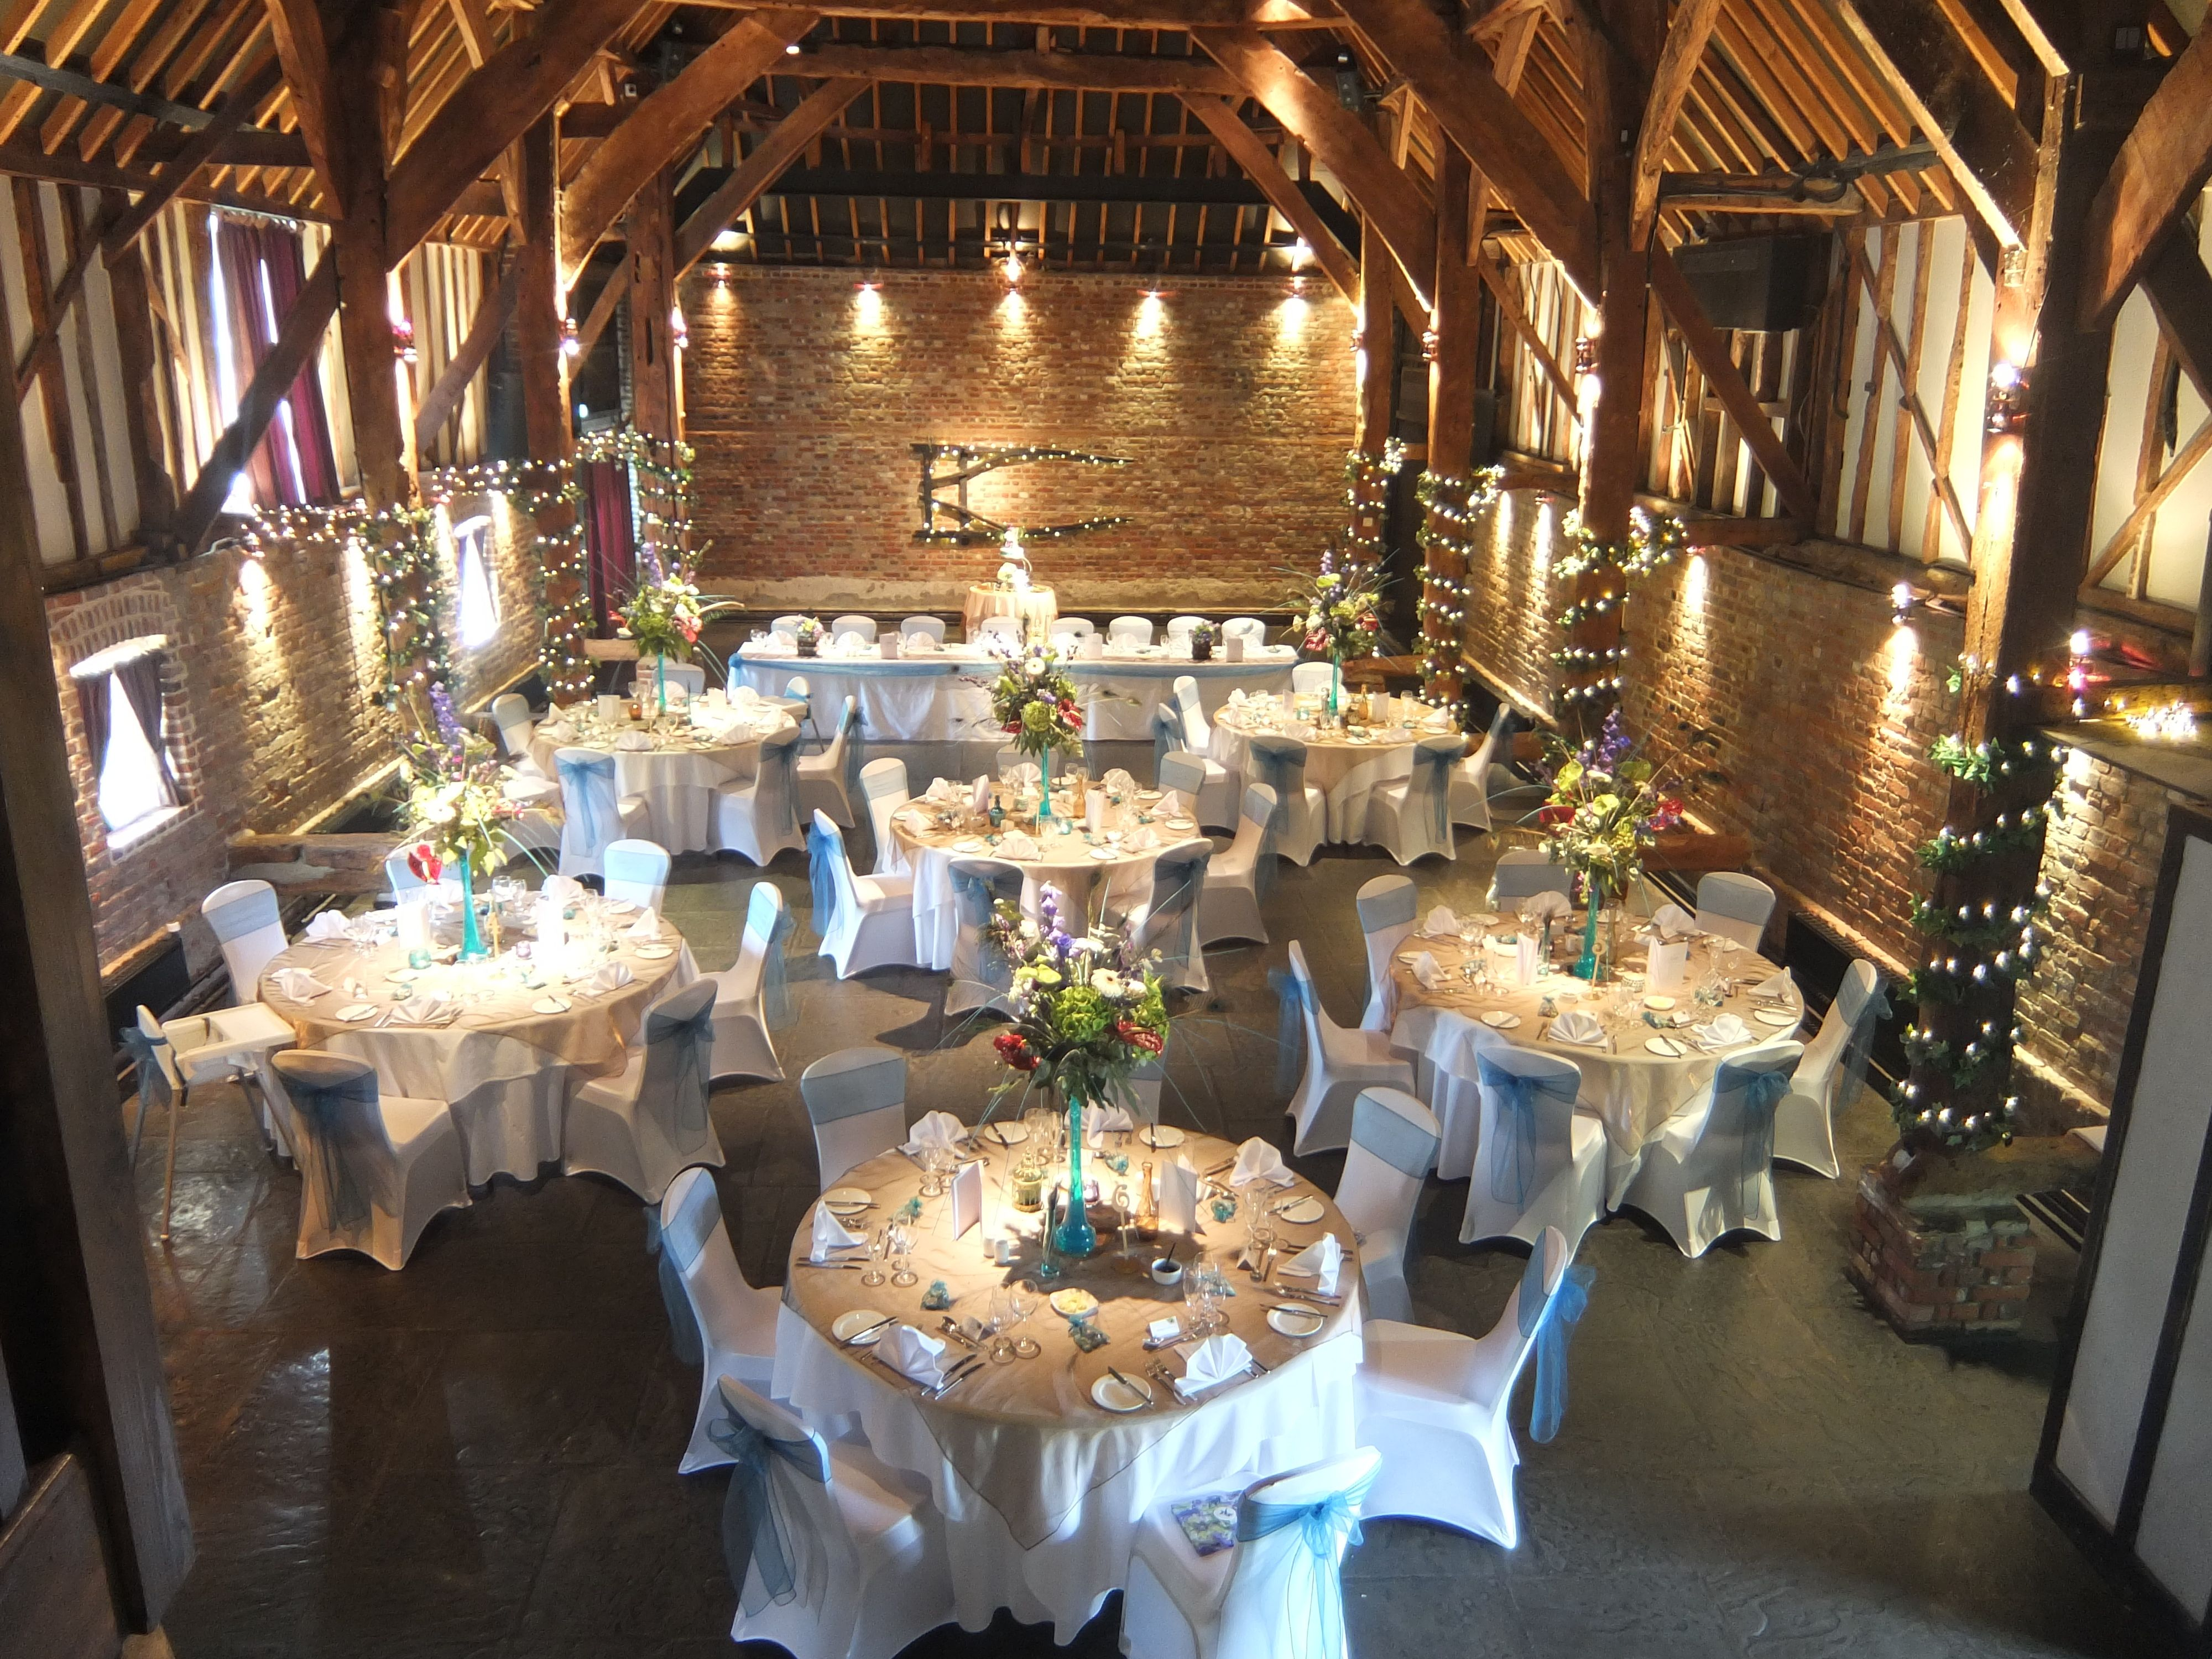 2148f40fc2a2d56ebc43b2e46dff223f - barn wedding kent